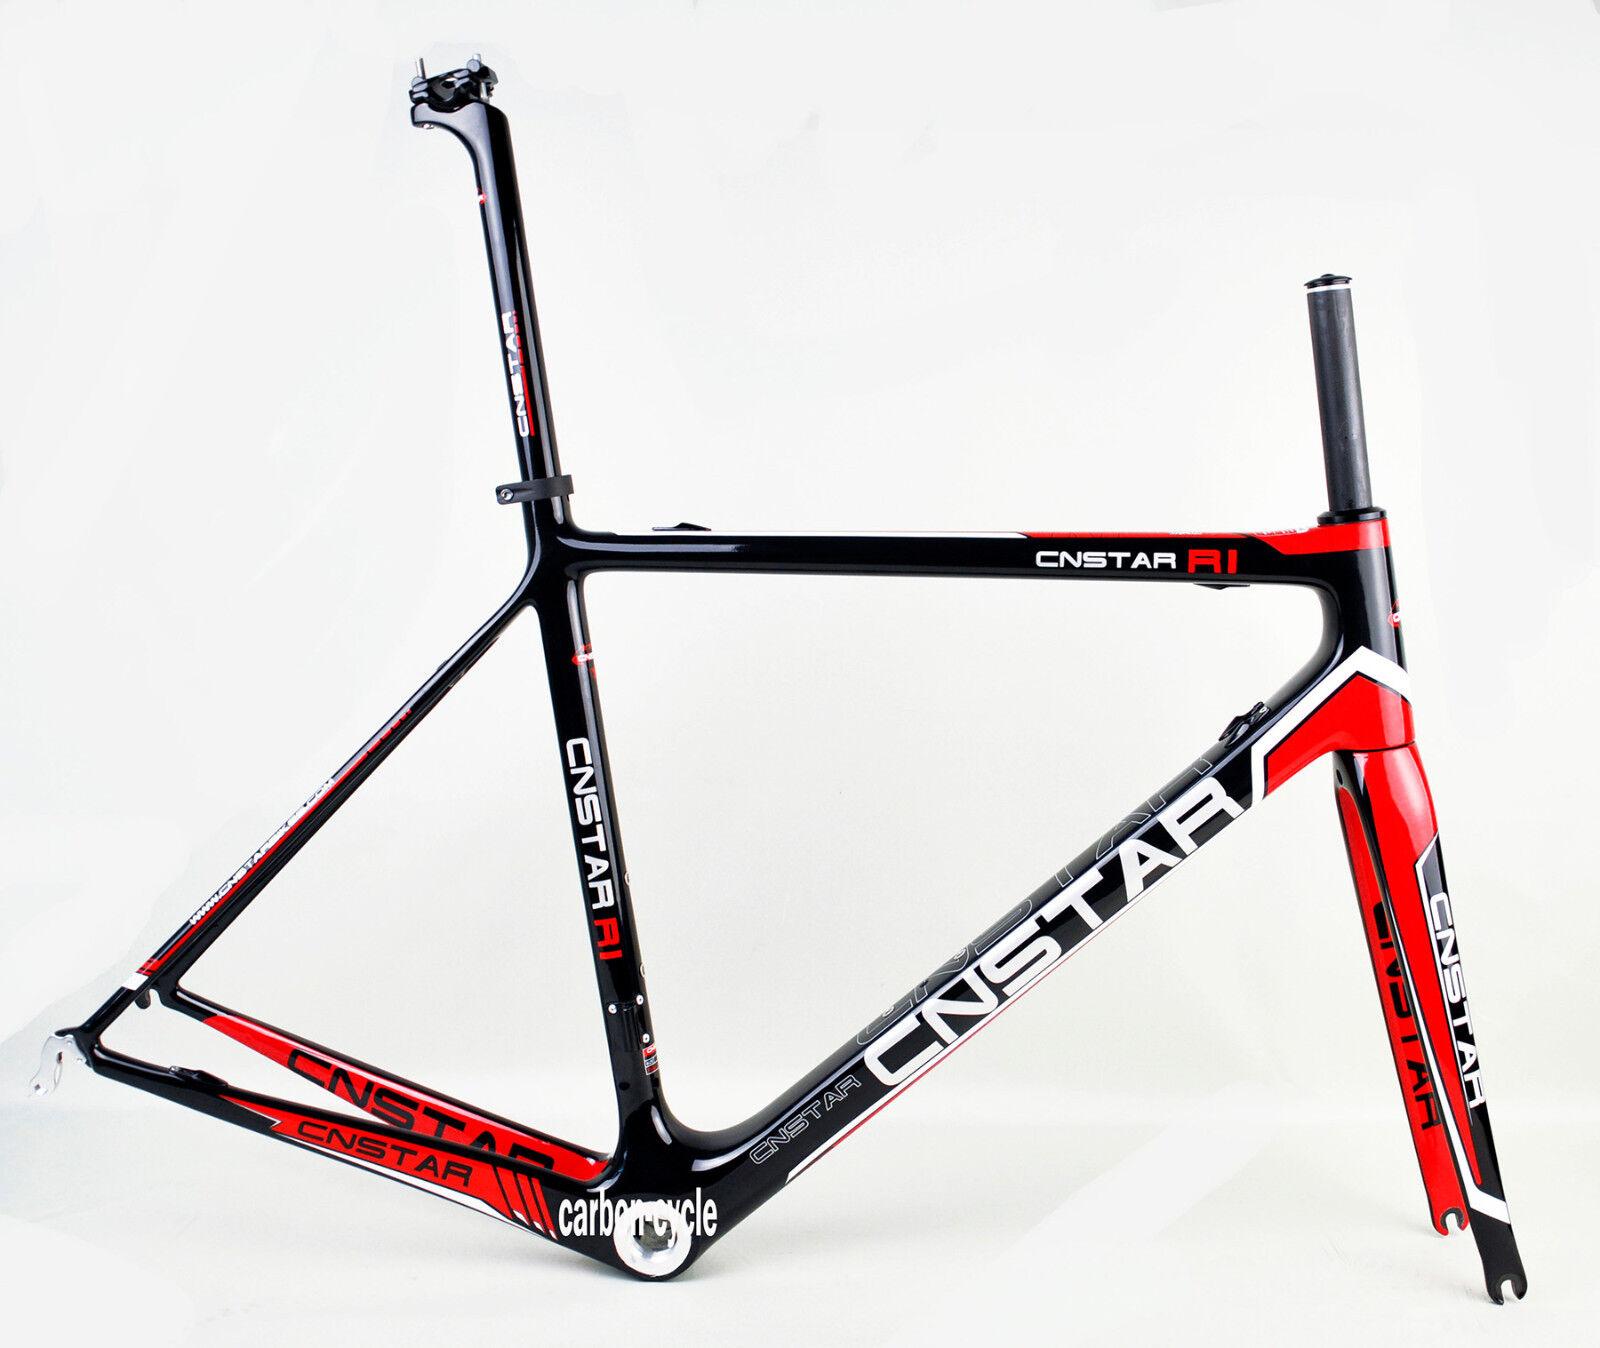 54cm BSA Carbon Road Frame Fork Road Bike Headset Internl Di2 rosso Glossy 700C